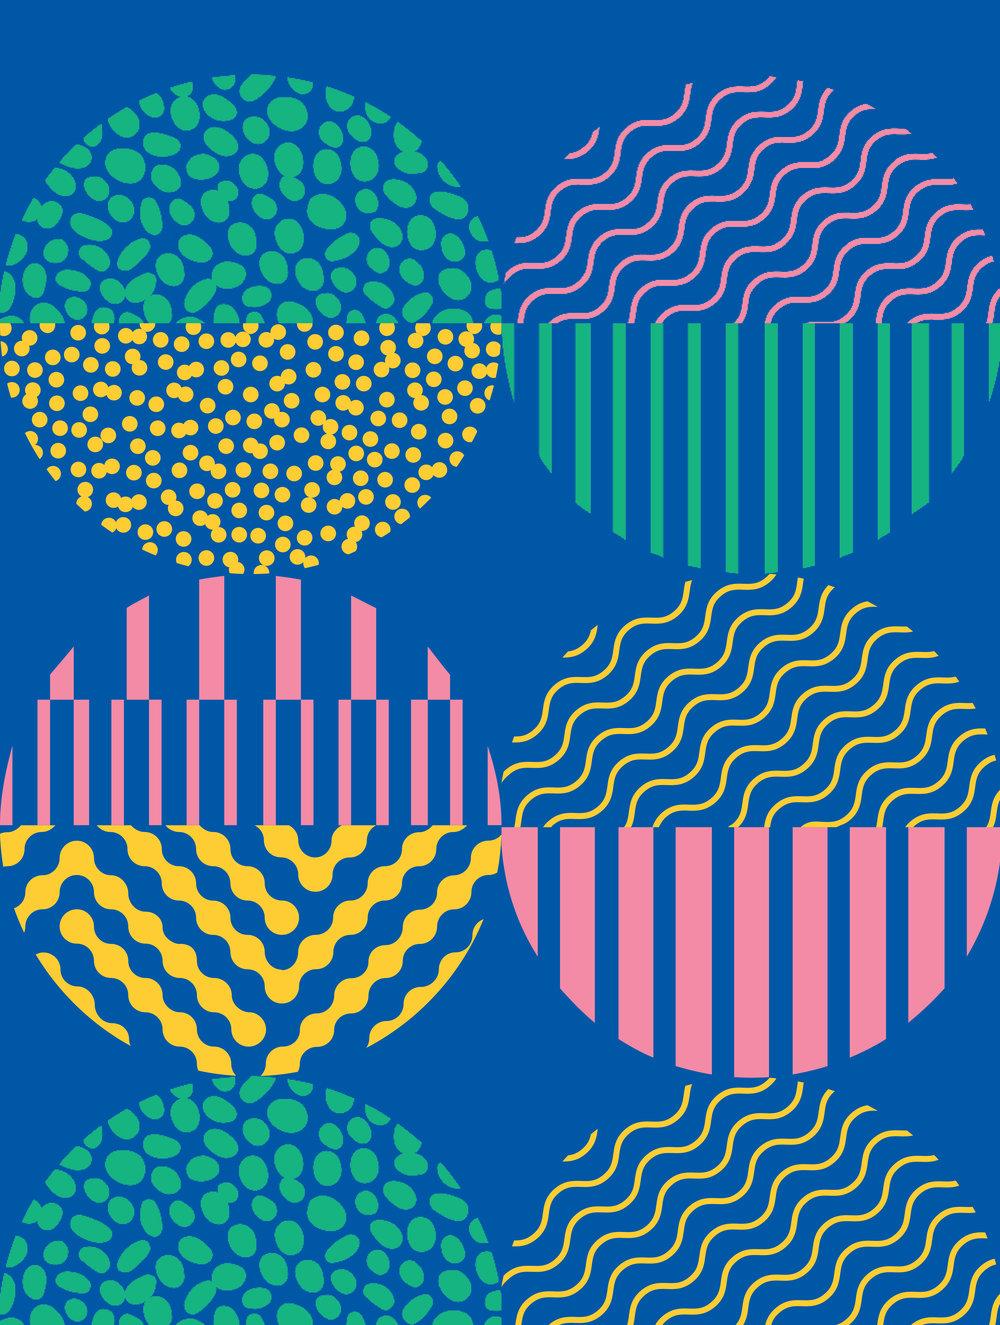 Treefort Music Festival - Corporate Identity/Branding